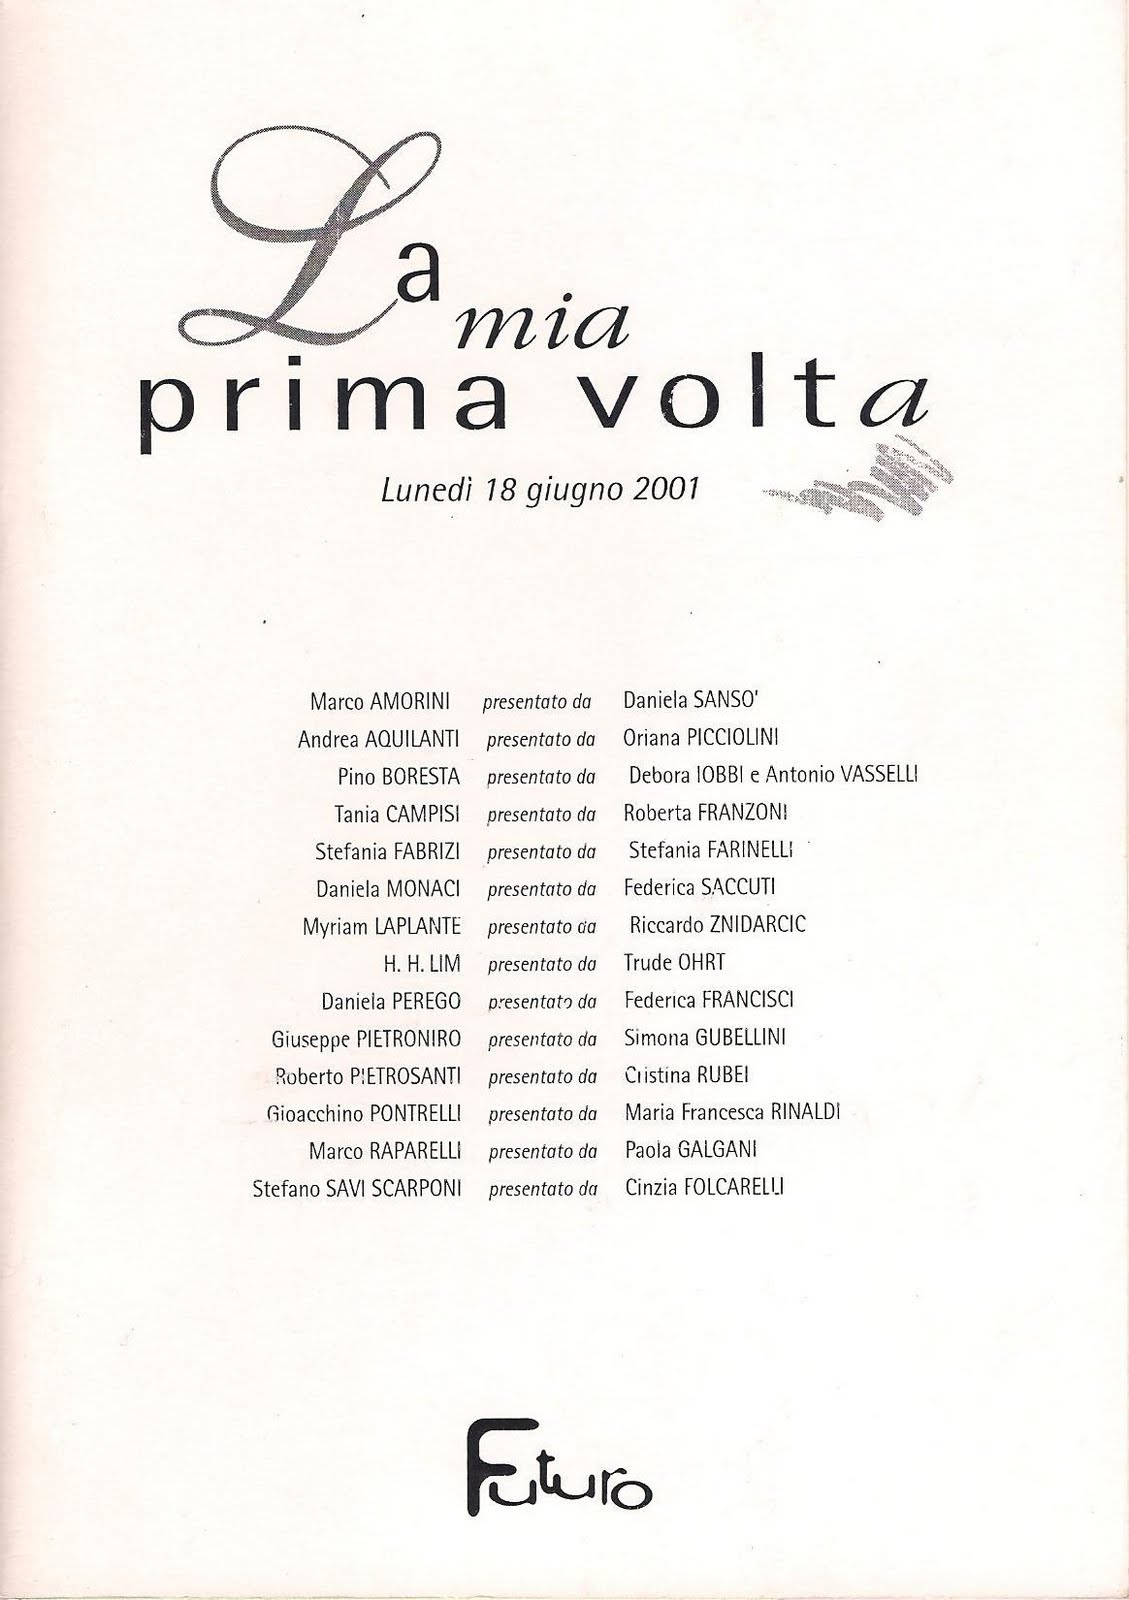 Stefano Savi Scarponi presentato da Cinzia Folcarelli